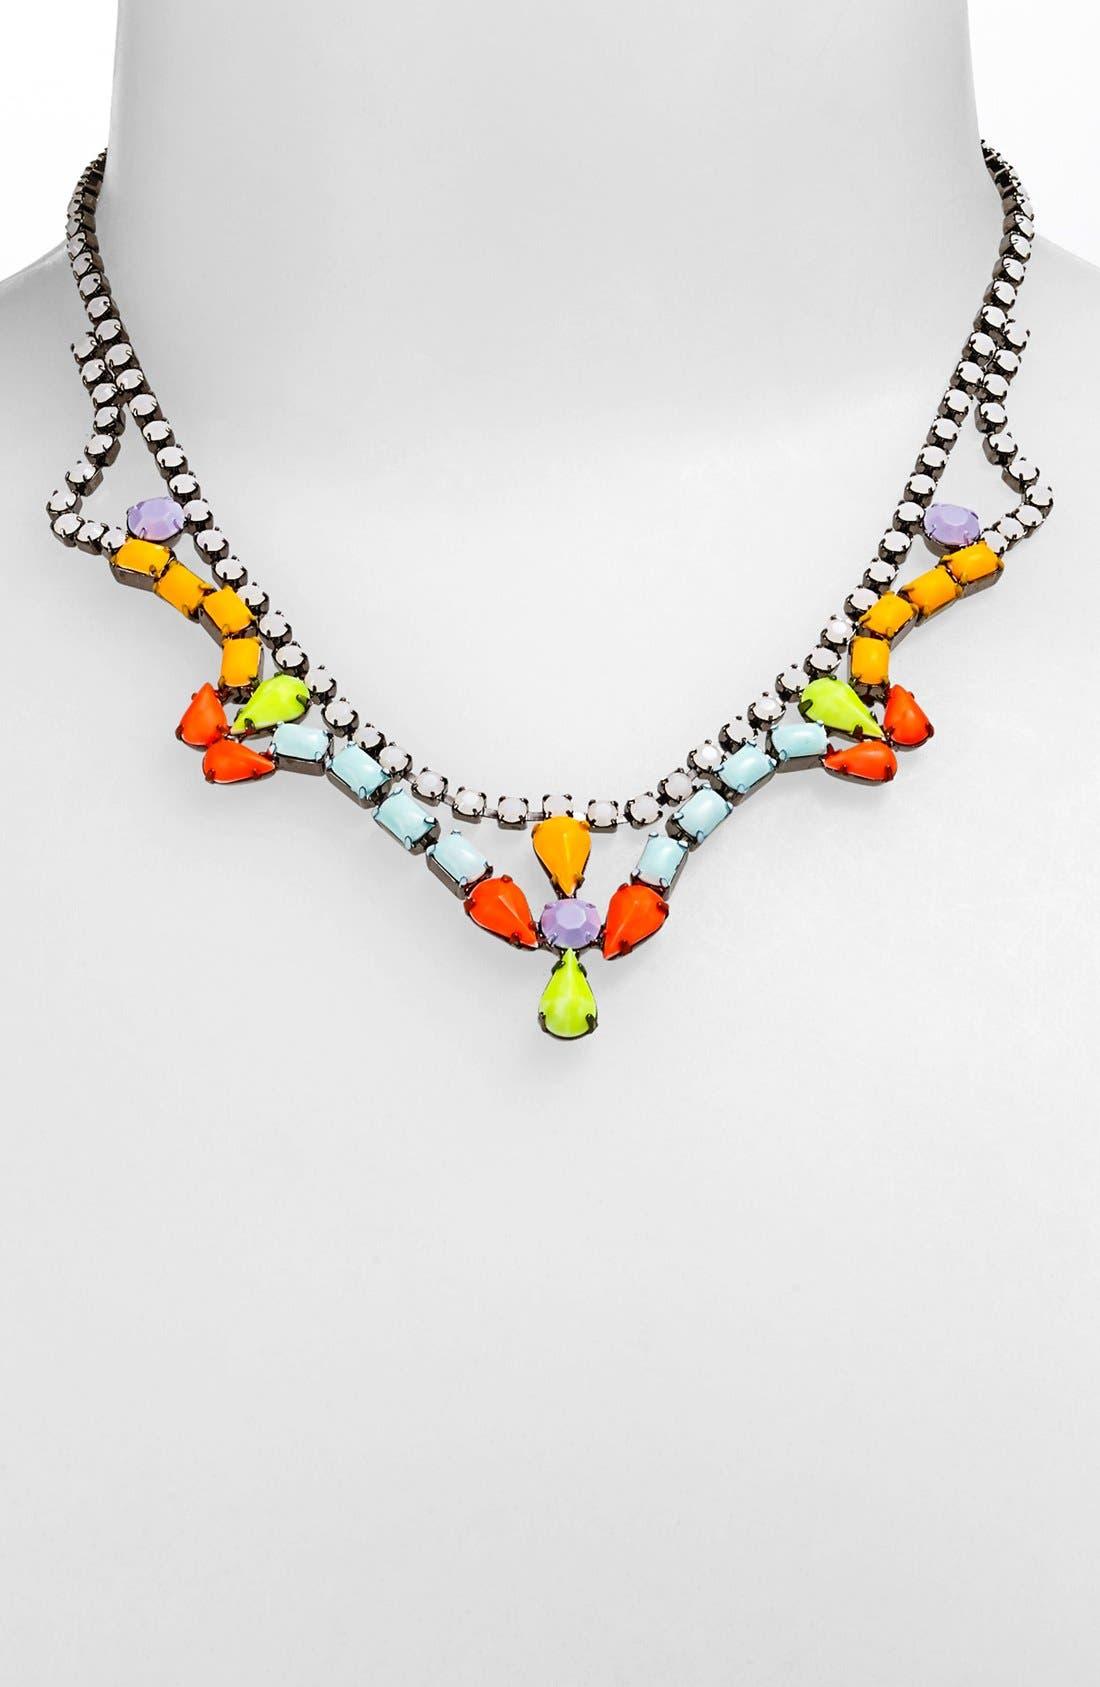 Main Image - Tom Binns 'Shadow Play' Necklace